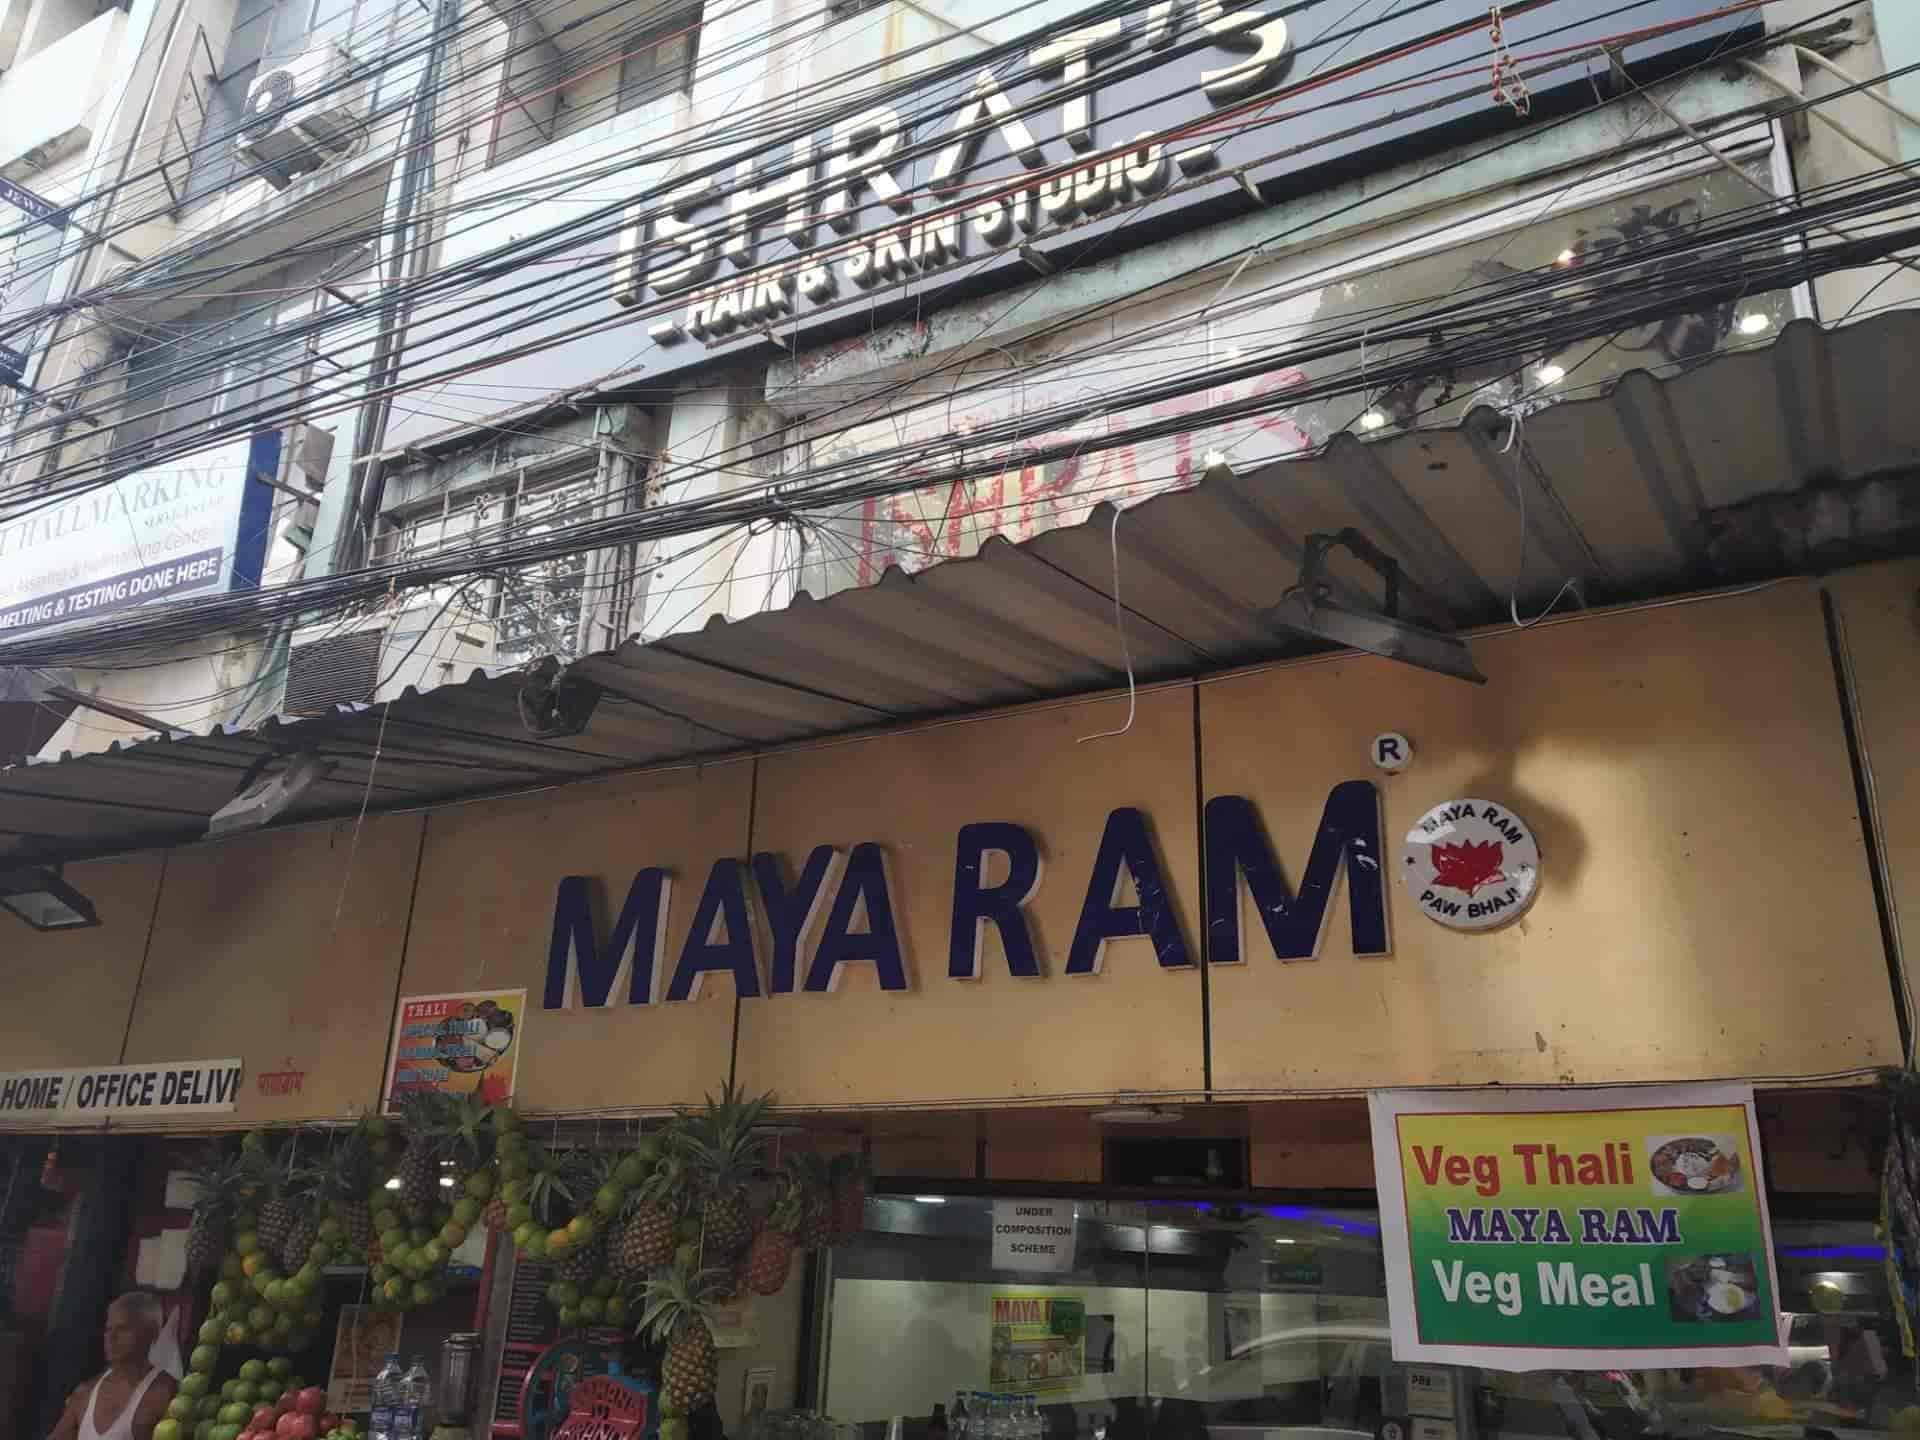 Maya Ram, Midleton Row, Kolkata - Desserts, Chinese, South Indian, North Indian, Fast Food, Continental, Street Food, Pure Vegetarian Cuisine Restaurant - Justdial